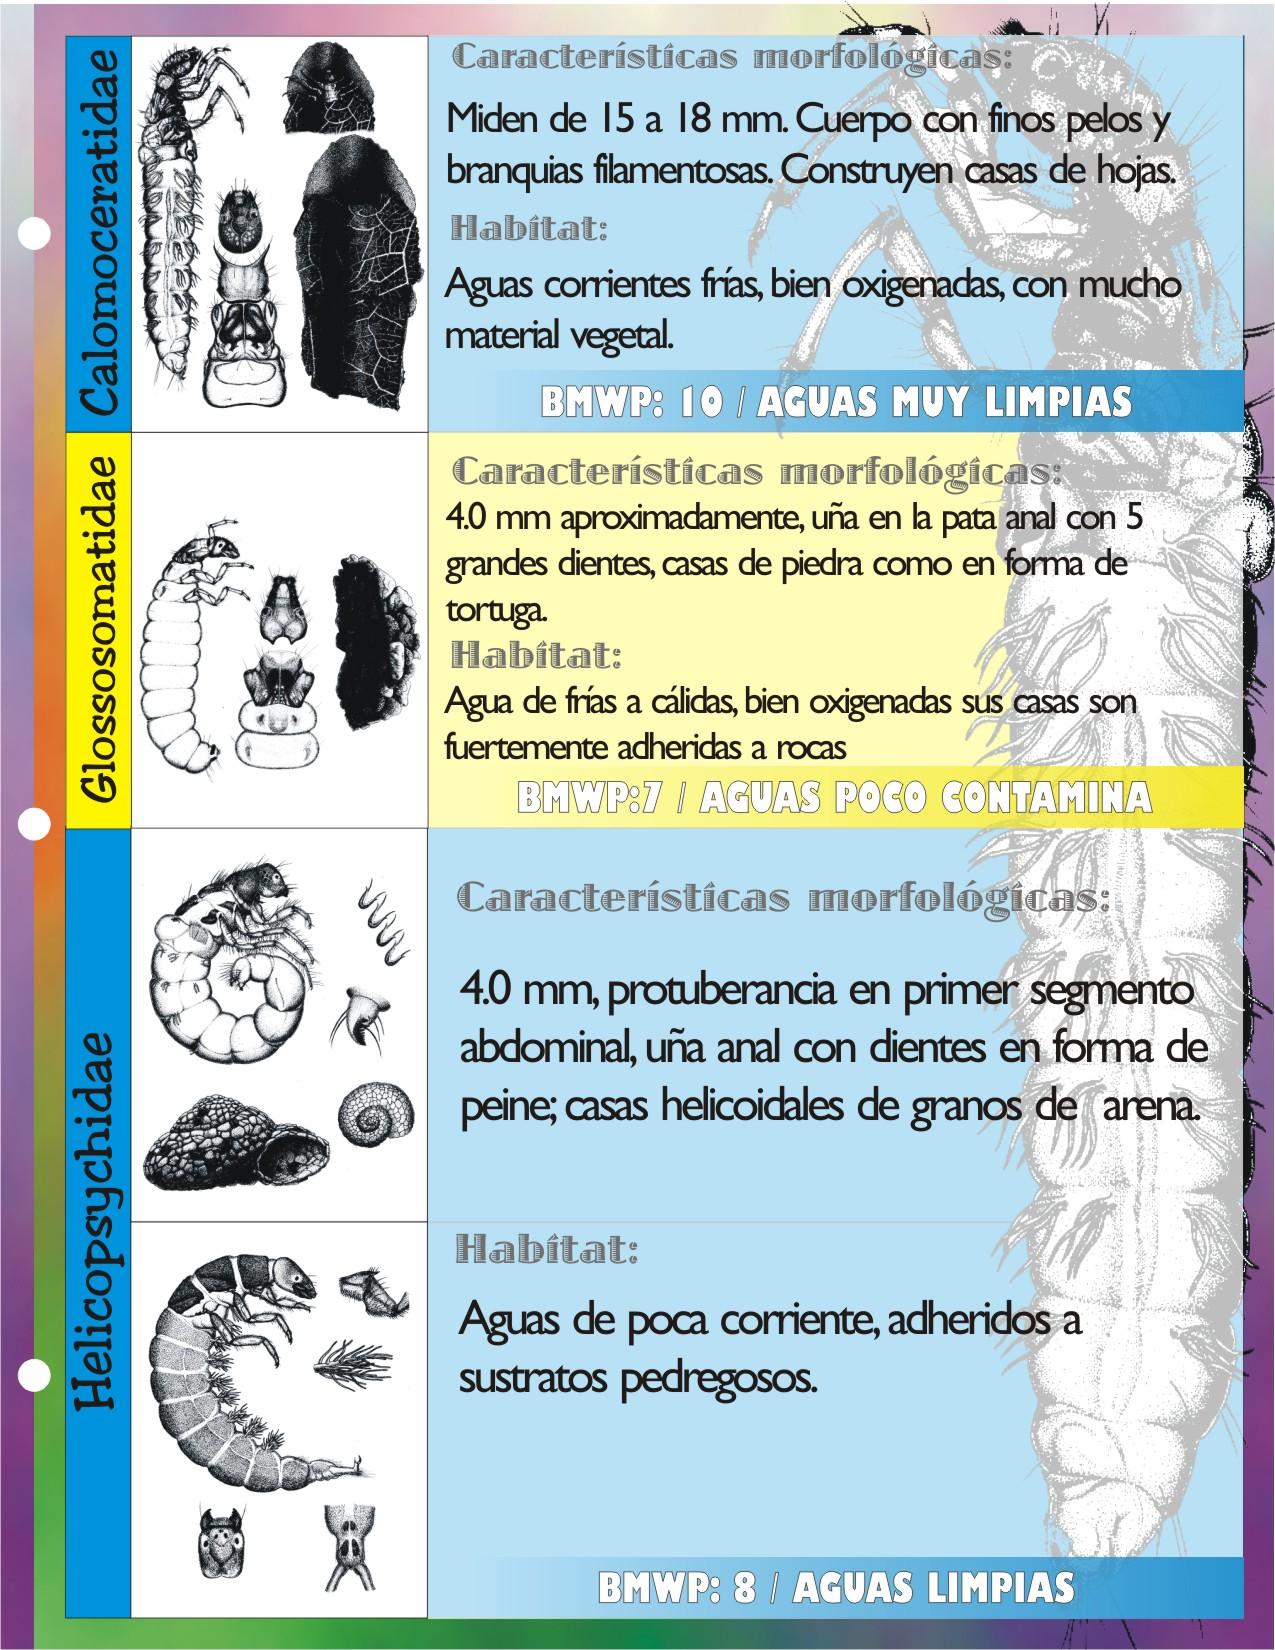 Trichoptera CALAMOCERATIDAE, GLOSSOSOMATIDAE, HELICOPSYCHIDAE, HYDROBIOSIDAE